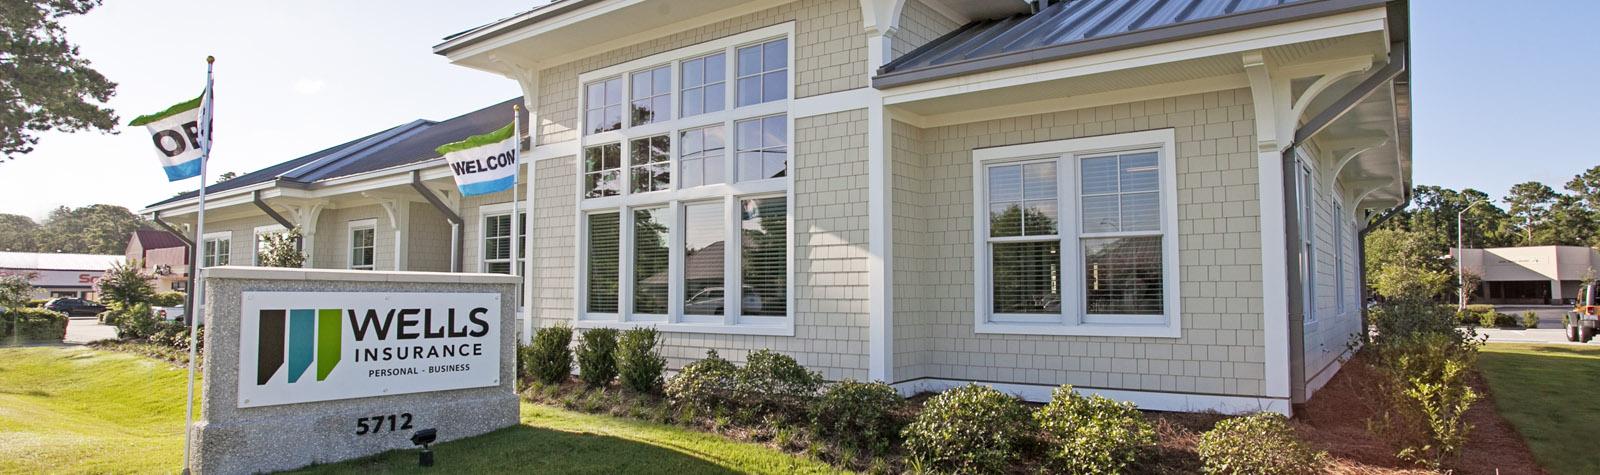 home and auto insurance work comp liability benefits marine